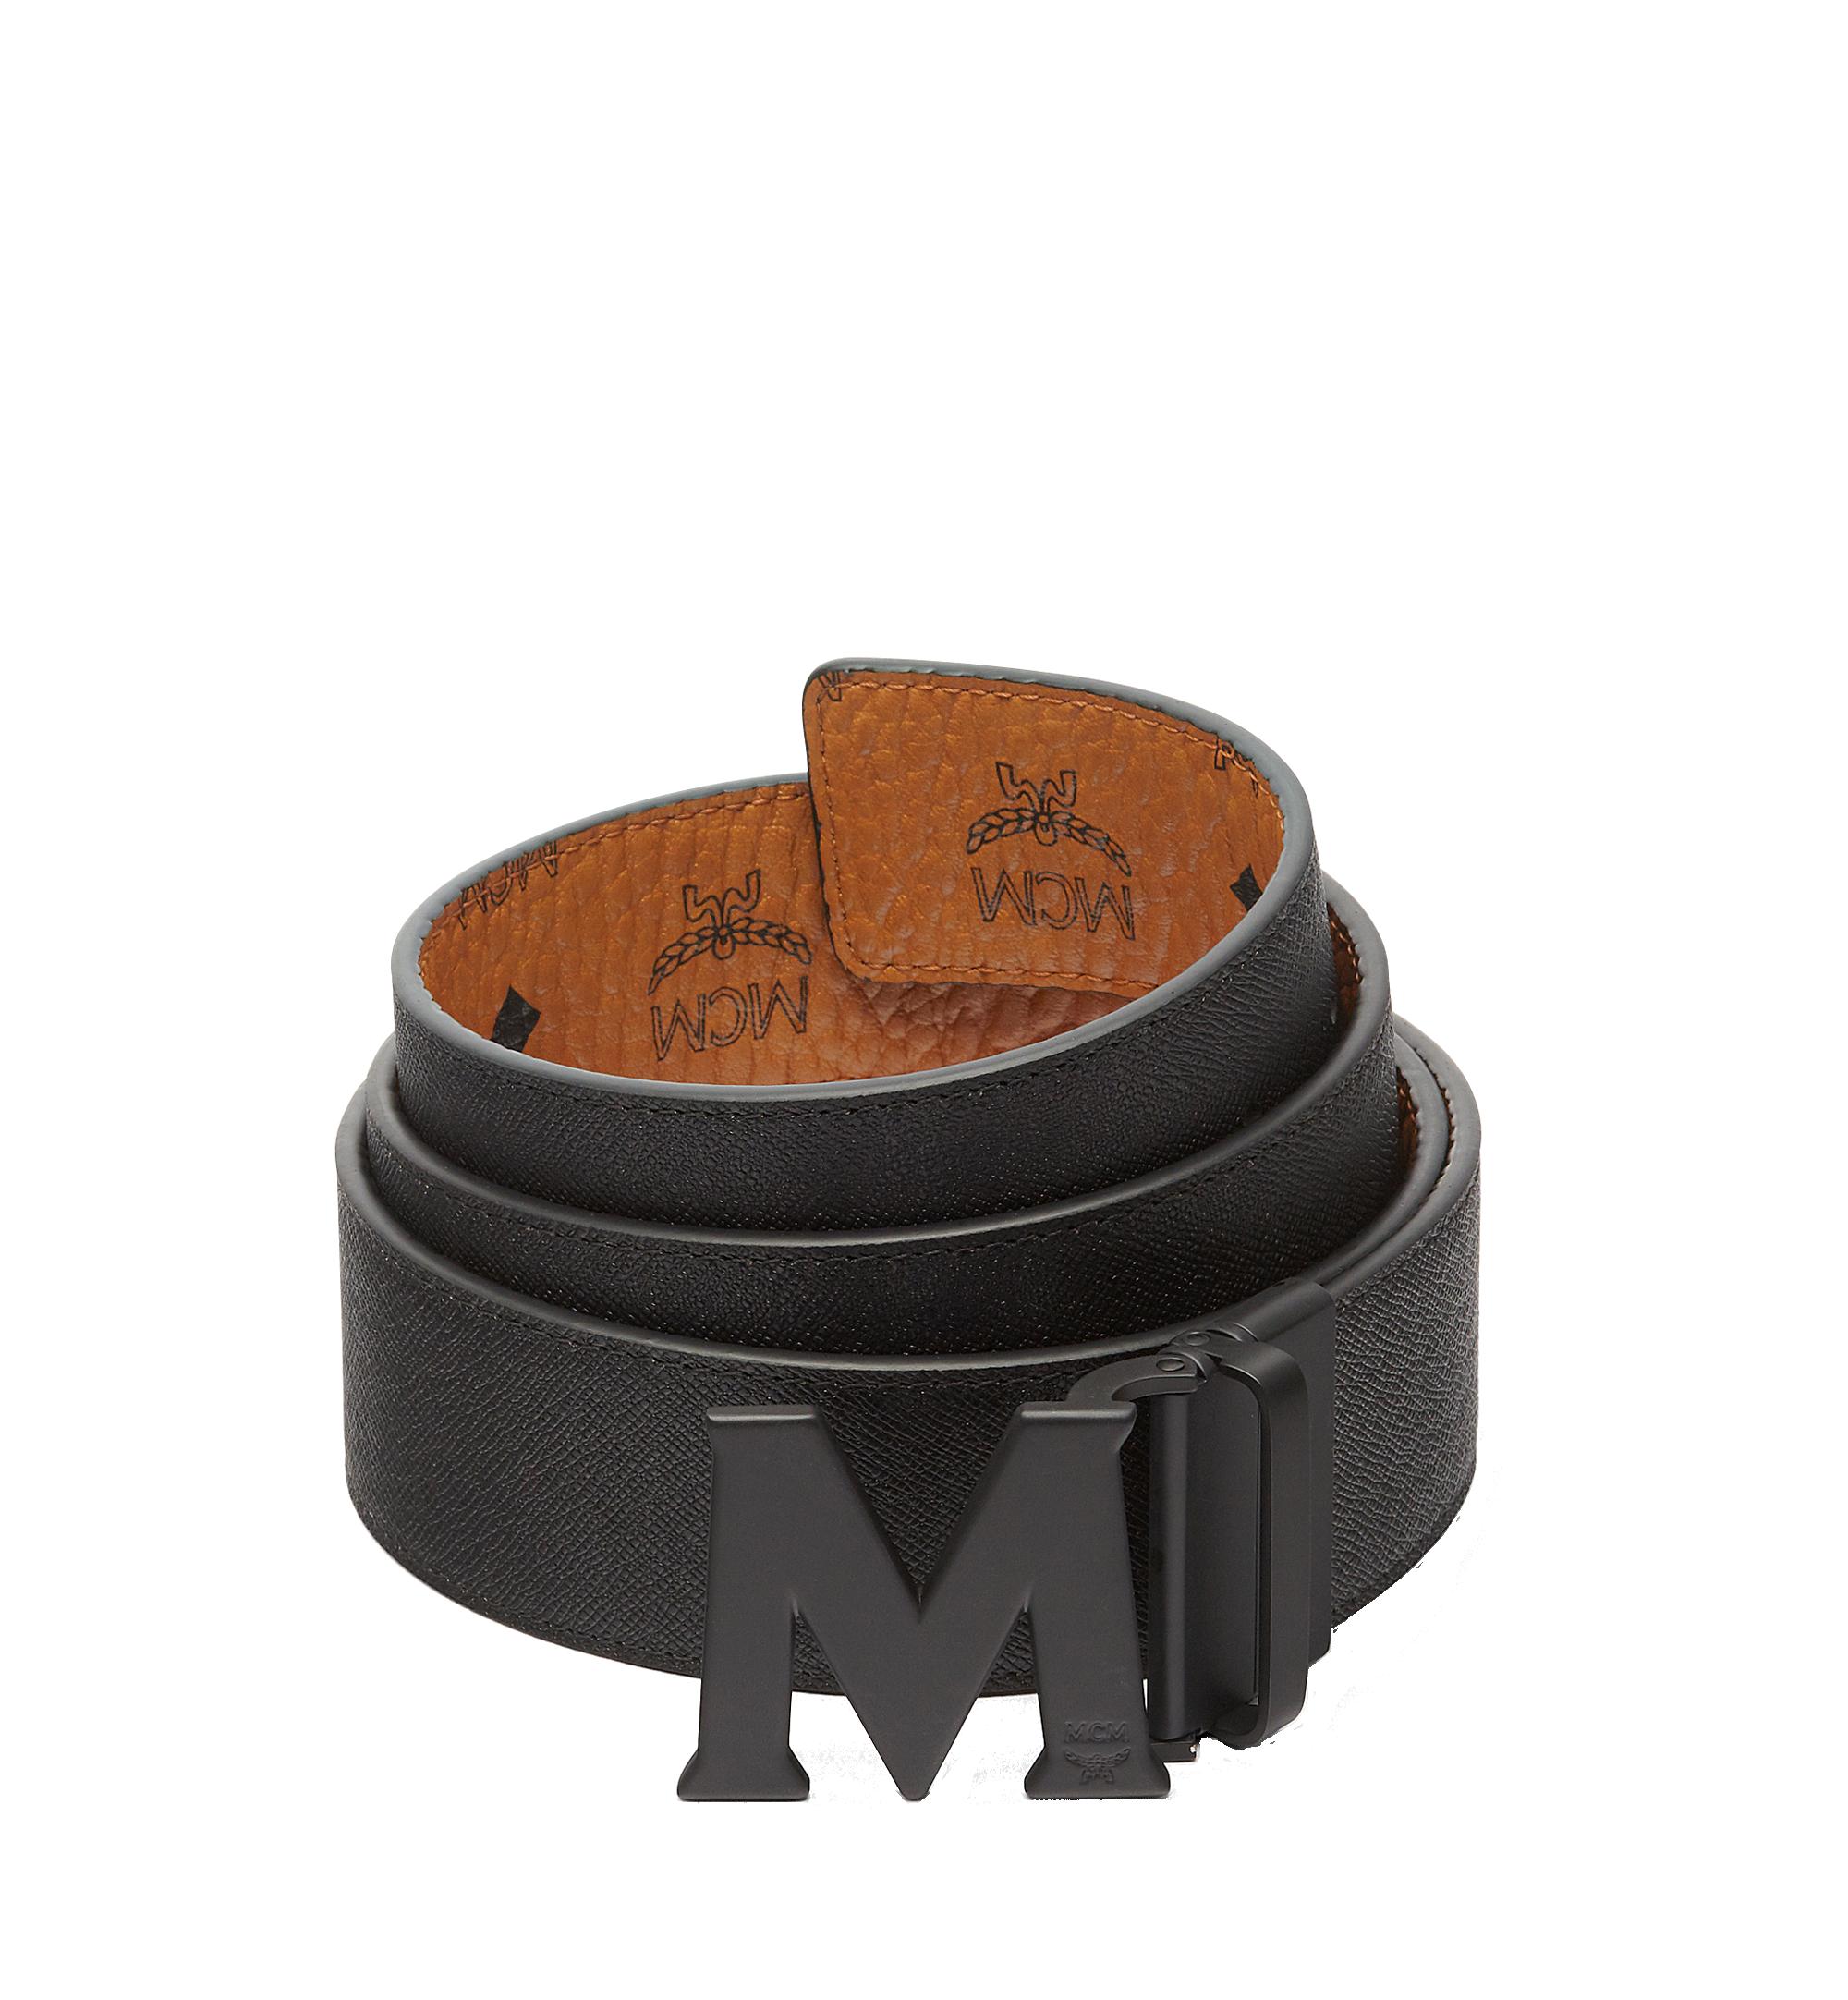 MCM Claus Matte M Reversible Belt 4.5 cm in Visetos Cognac MXBAAVI08CO001 Alternate View 1